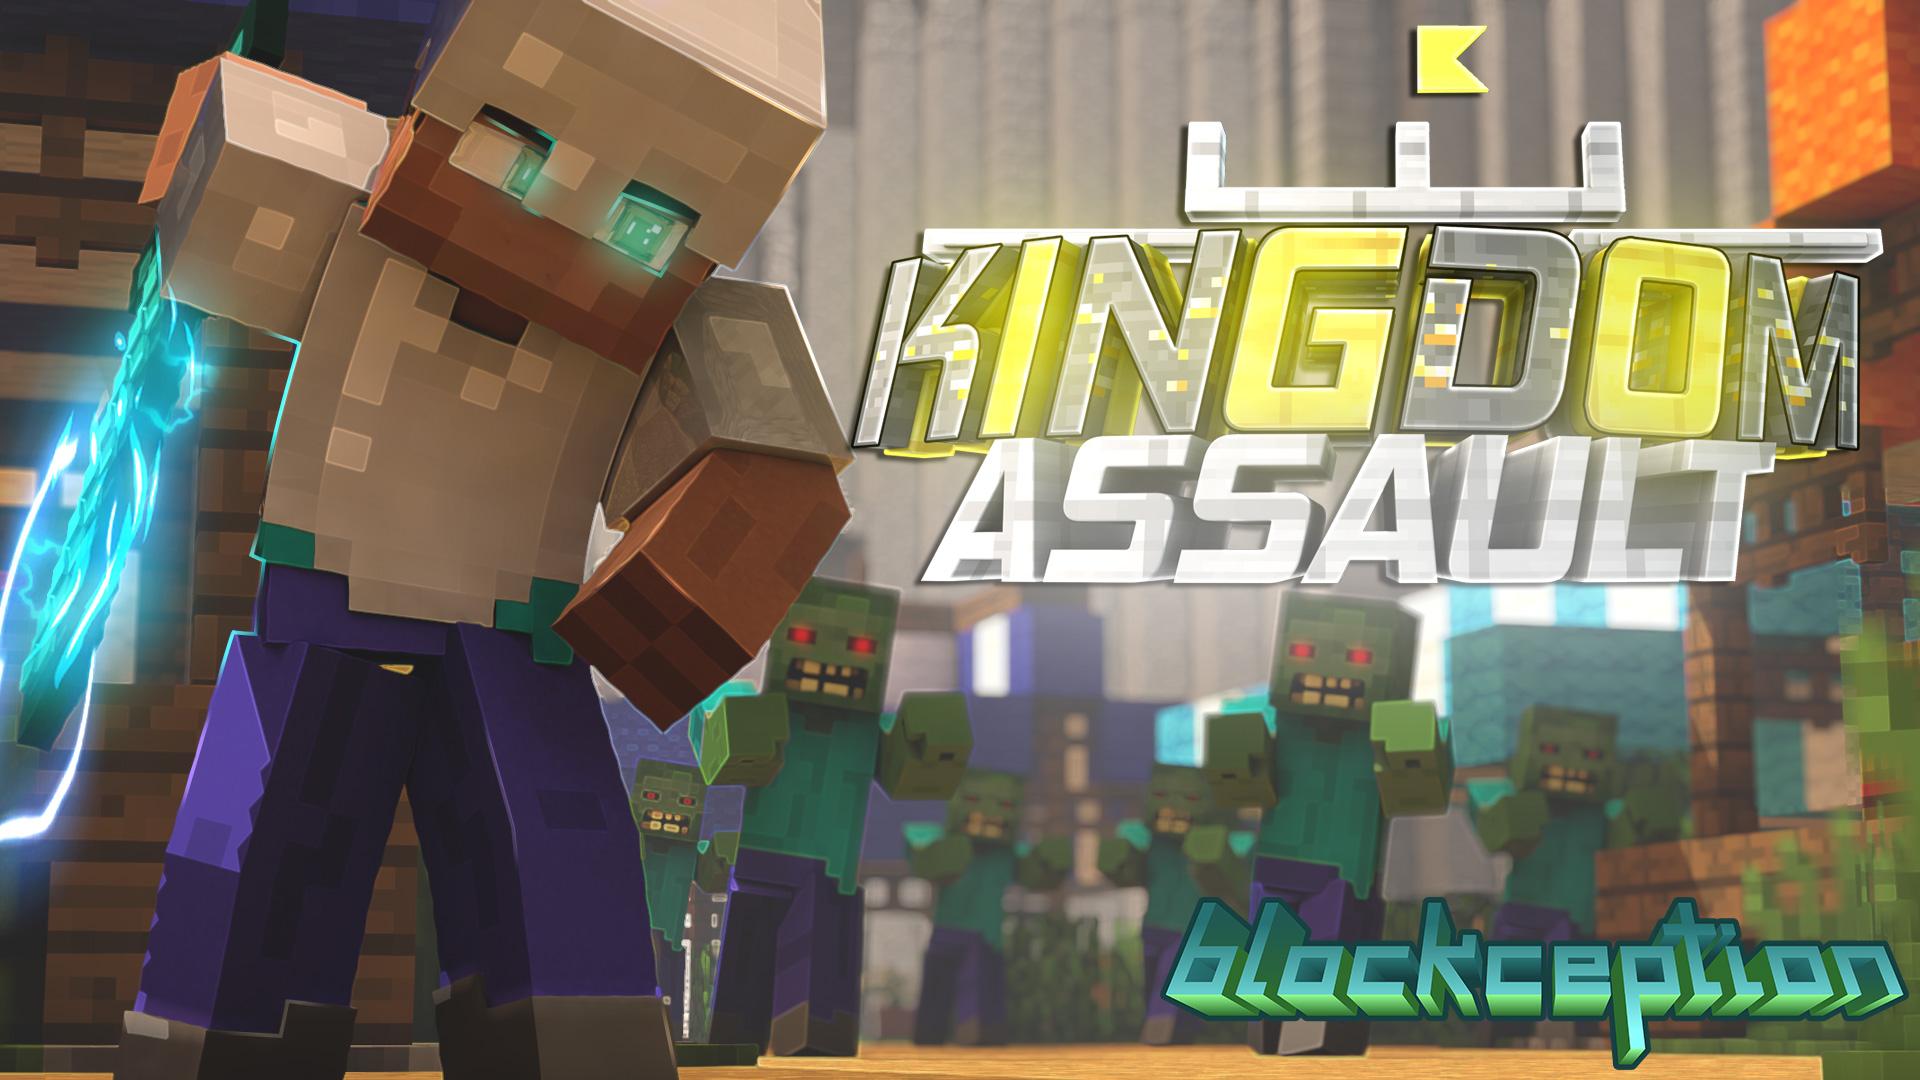 KINGDOM_ASSAULT_1920x1080.png